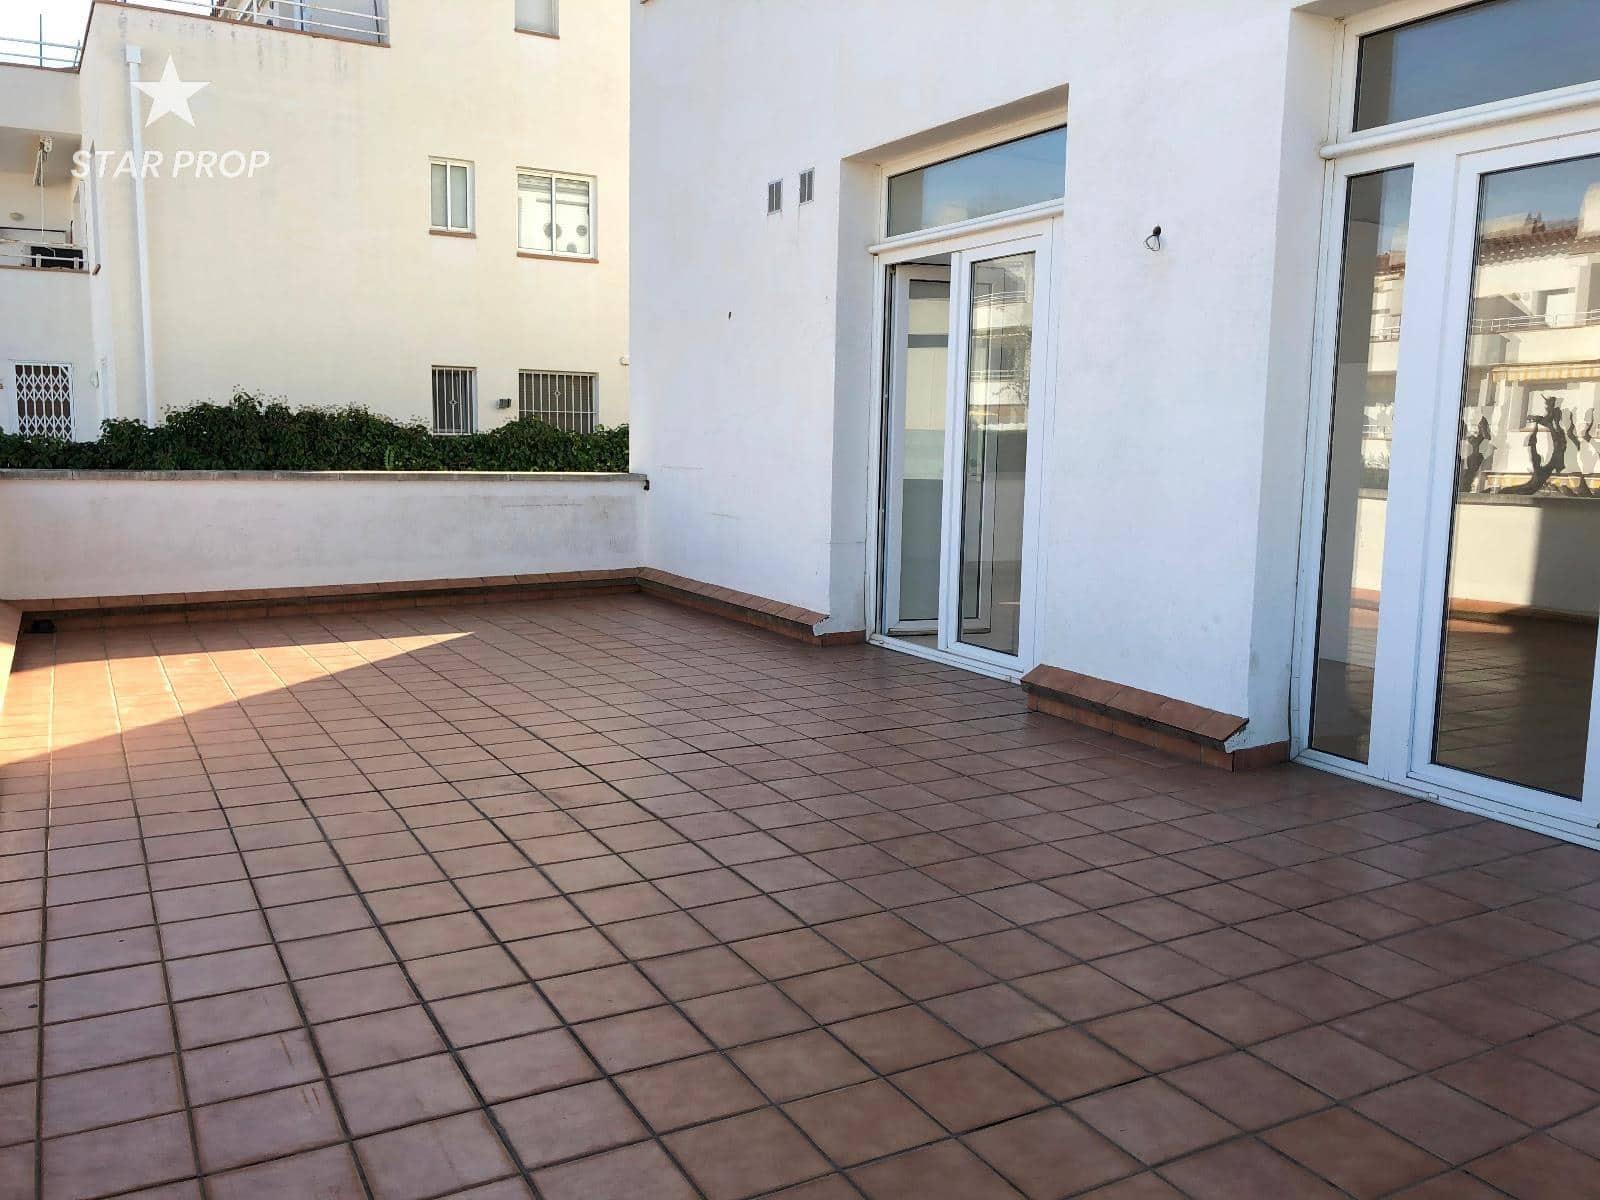 Commercial for rent in Llanca - € 750 (Ref: 4973925)